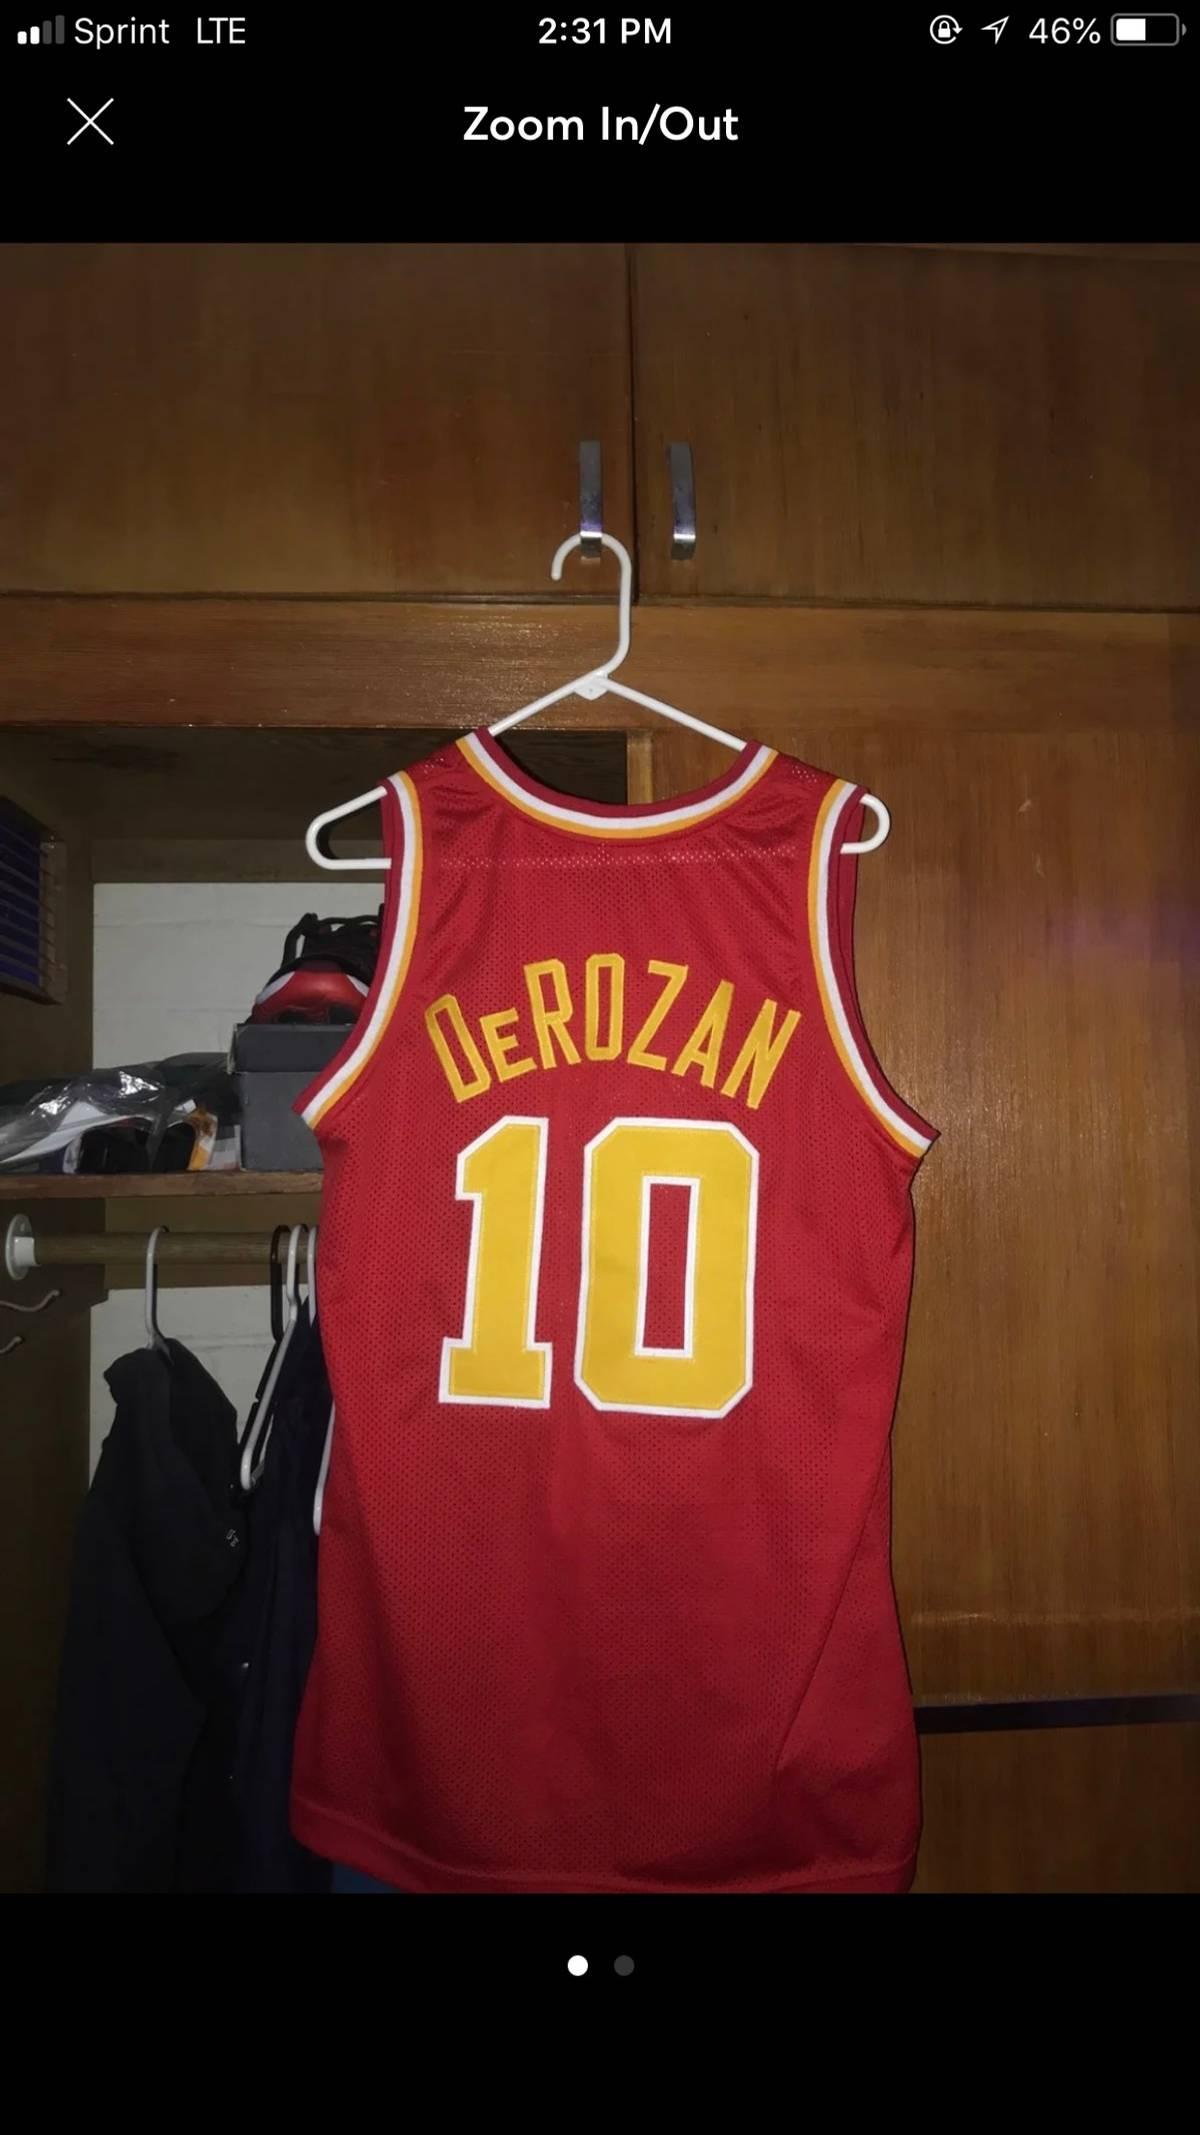 low priced 176a9 0f931 Custom Piece De Mar De Rozan Usc Basketball Jersey #10 Size M $60